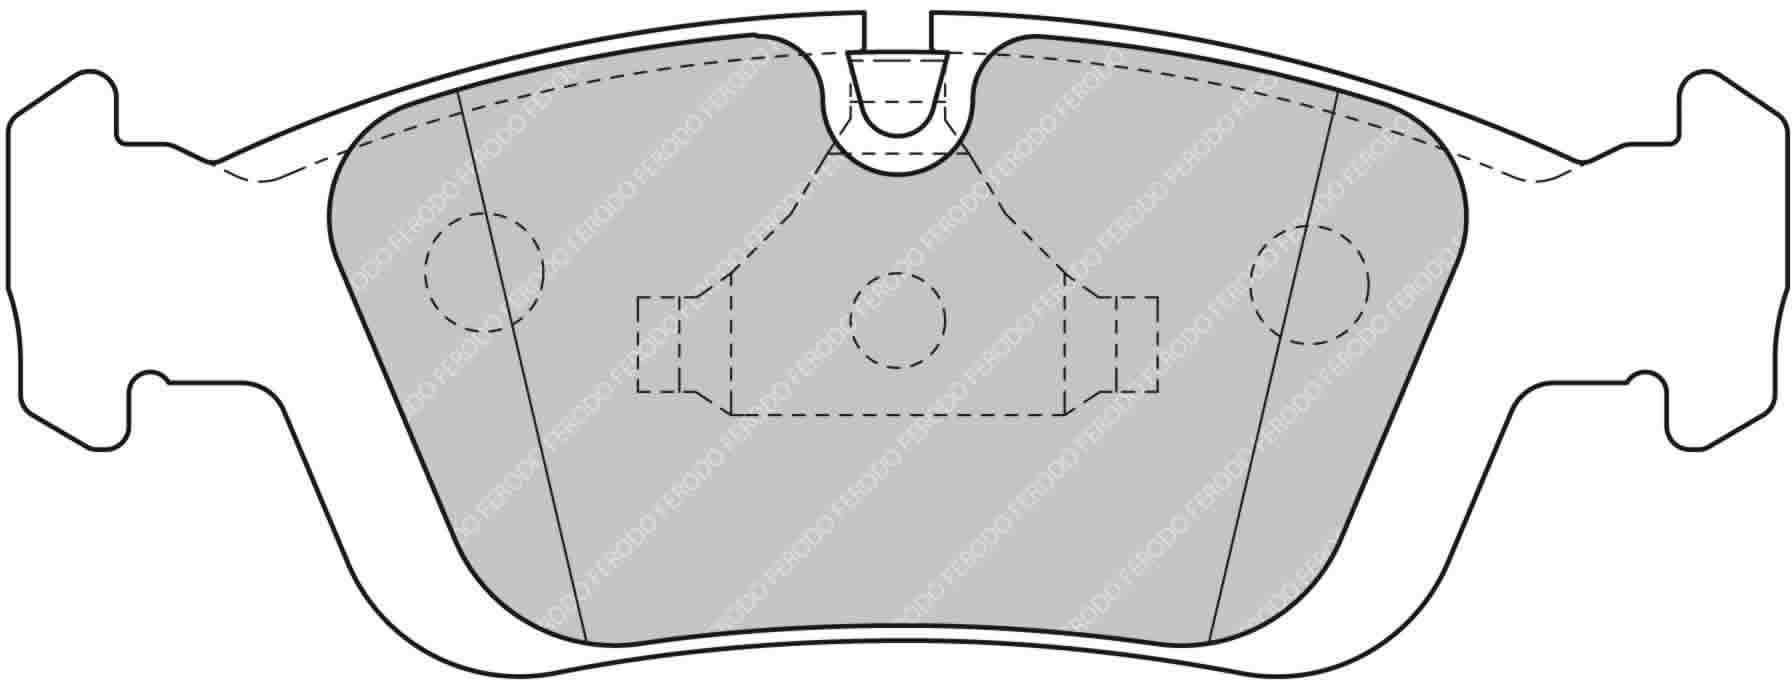 FCP1300H Car Racing - Brake Pads - Fcp1300